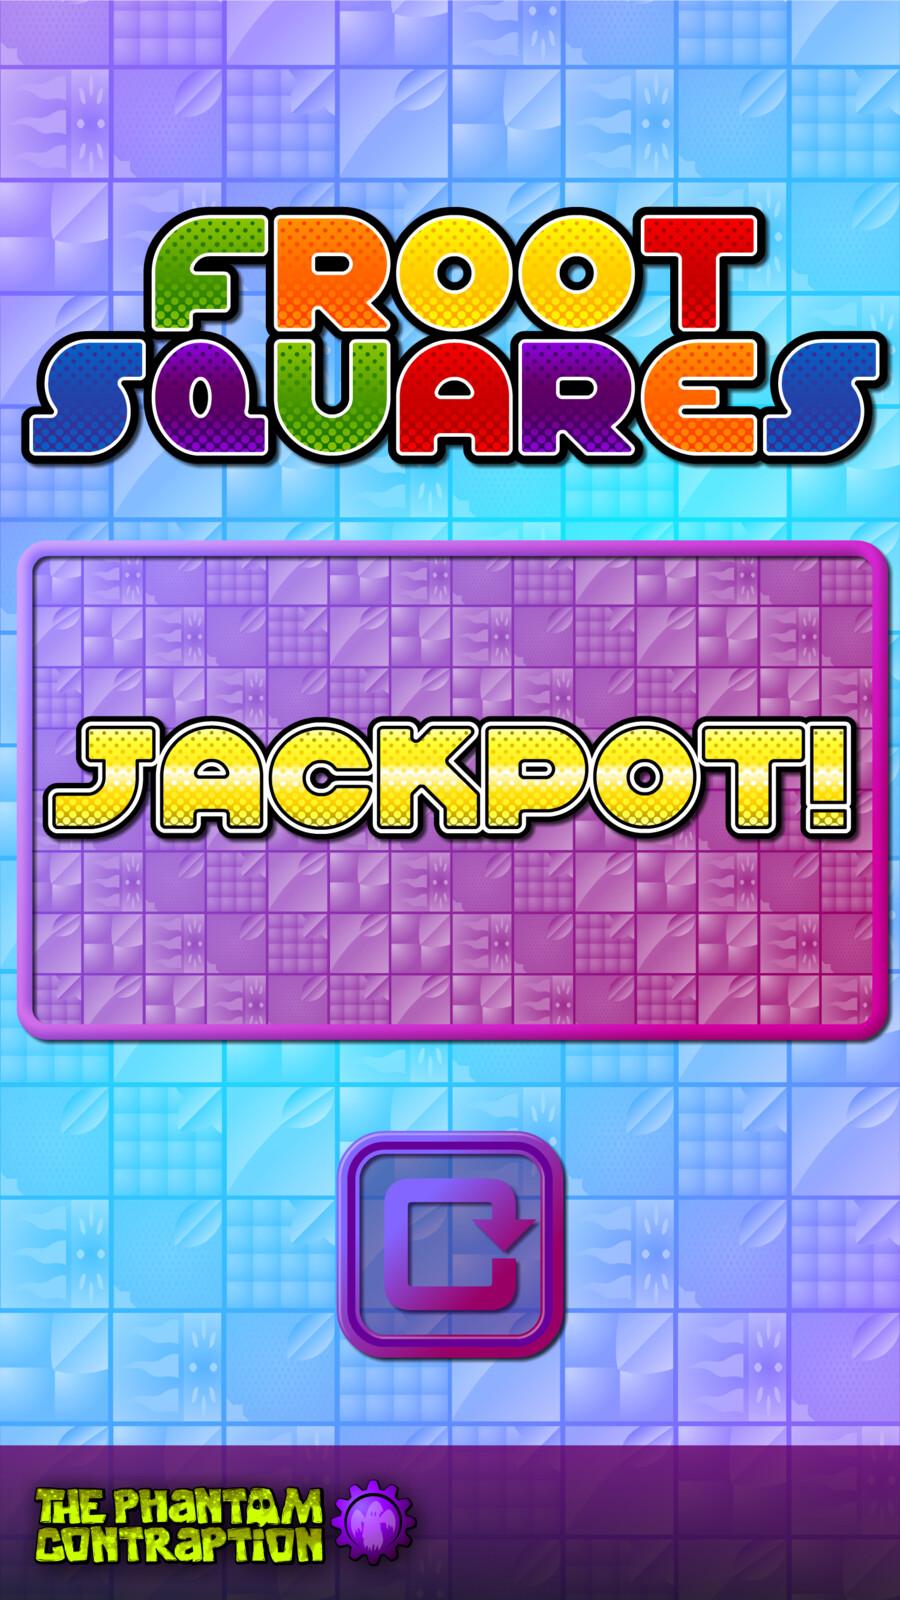 Froot Squares Portrait Screenshot: Jackpot Screen